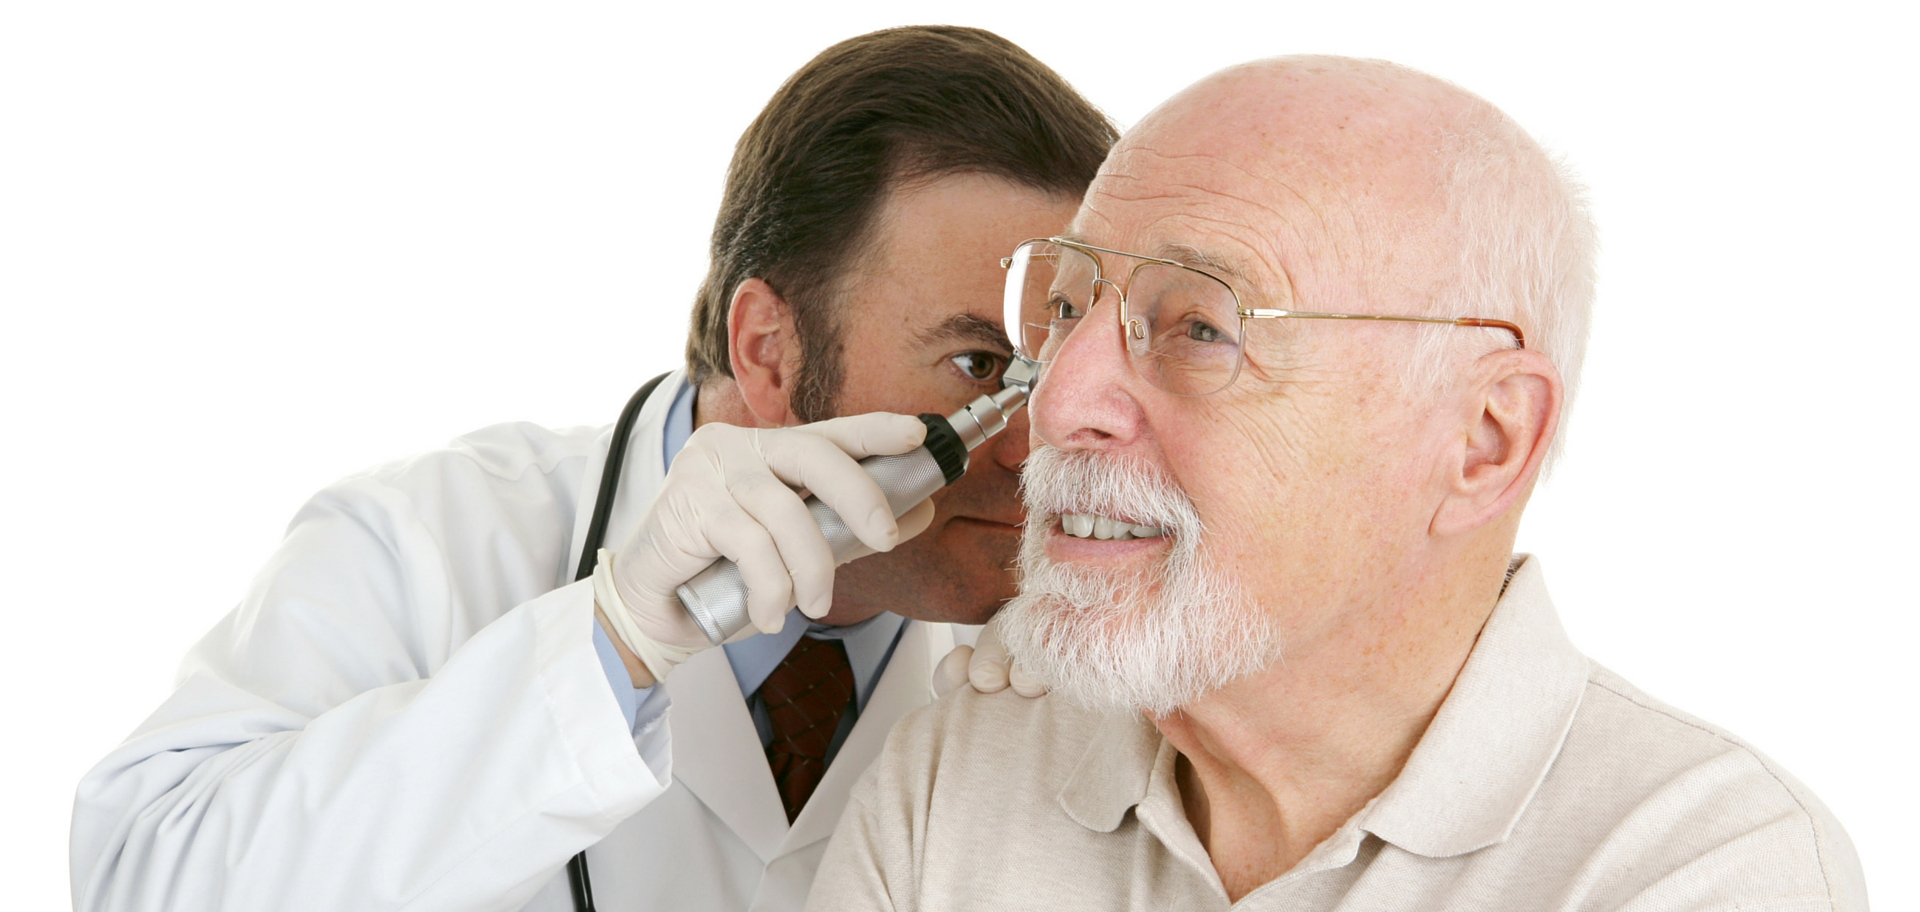 Essential health check ups for men